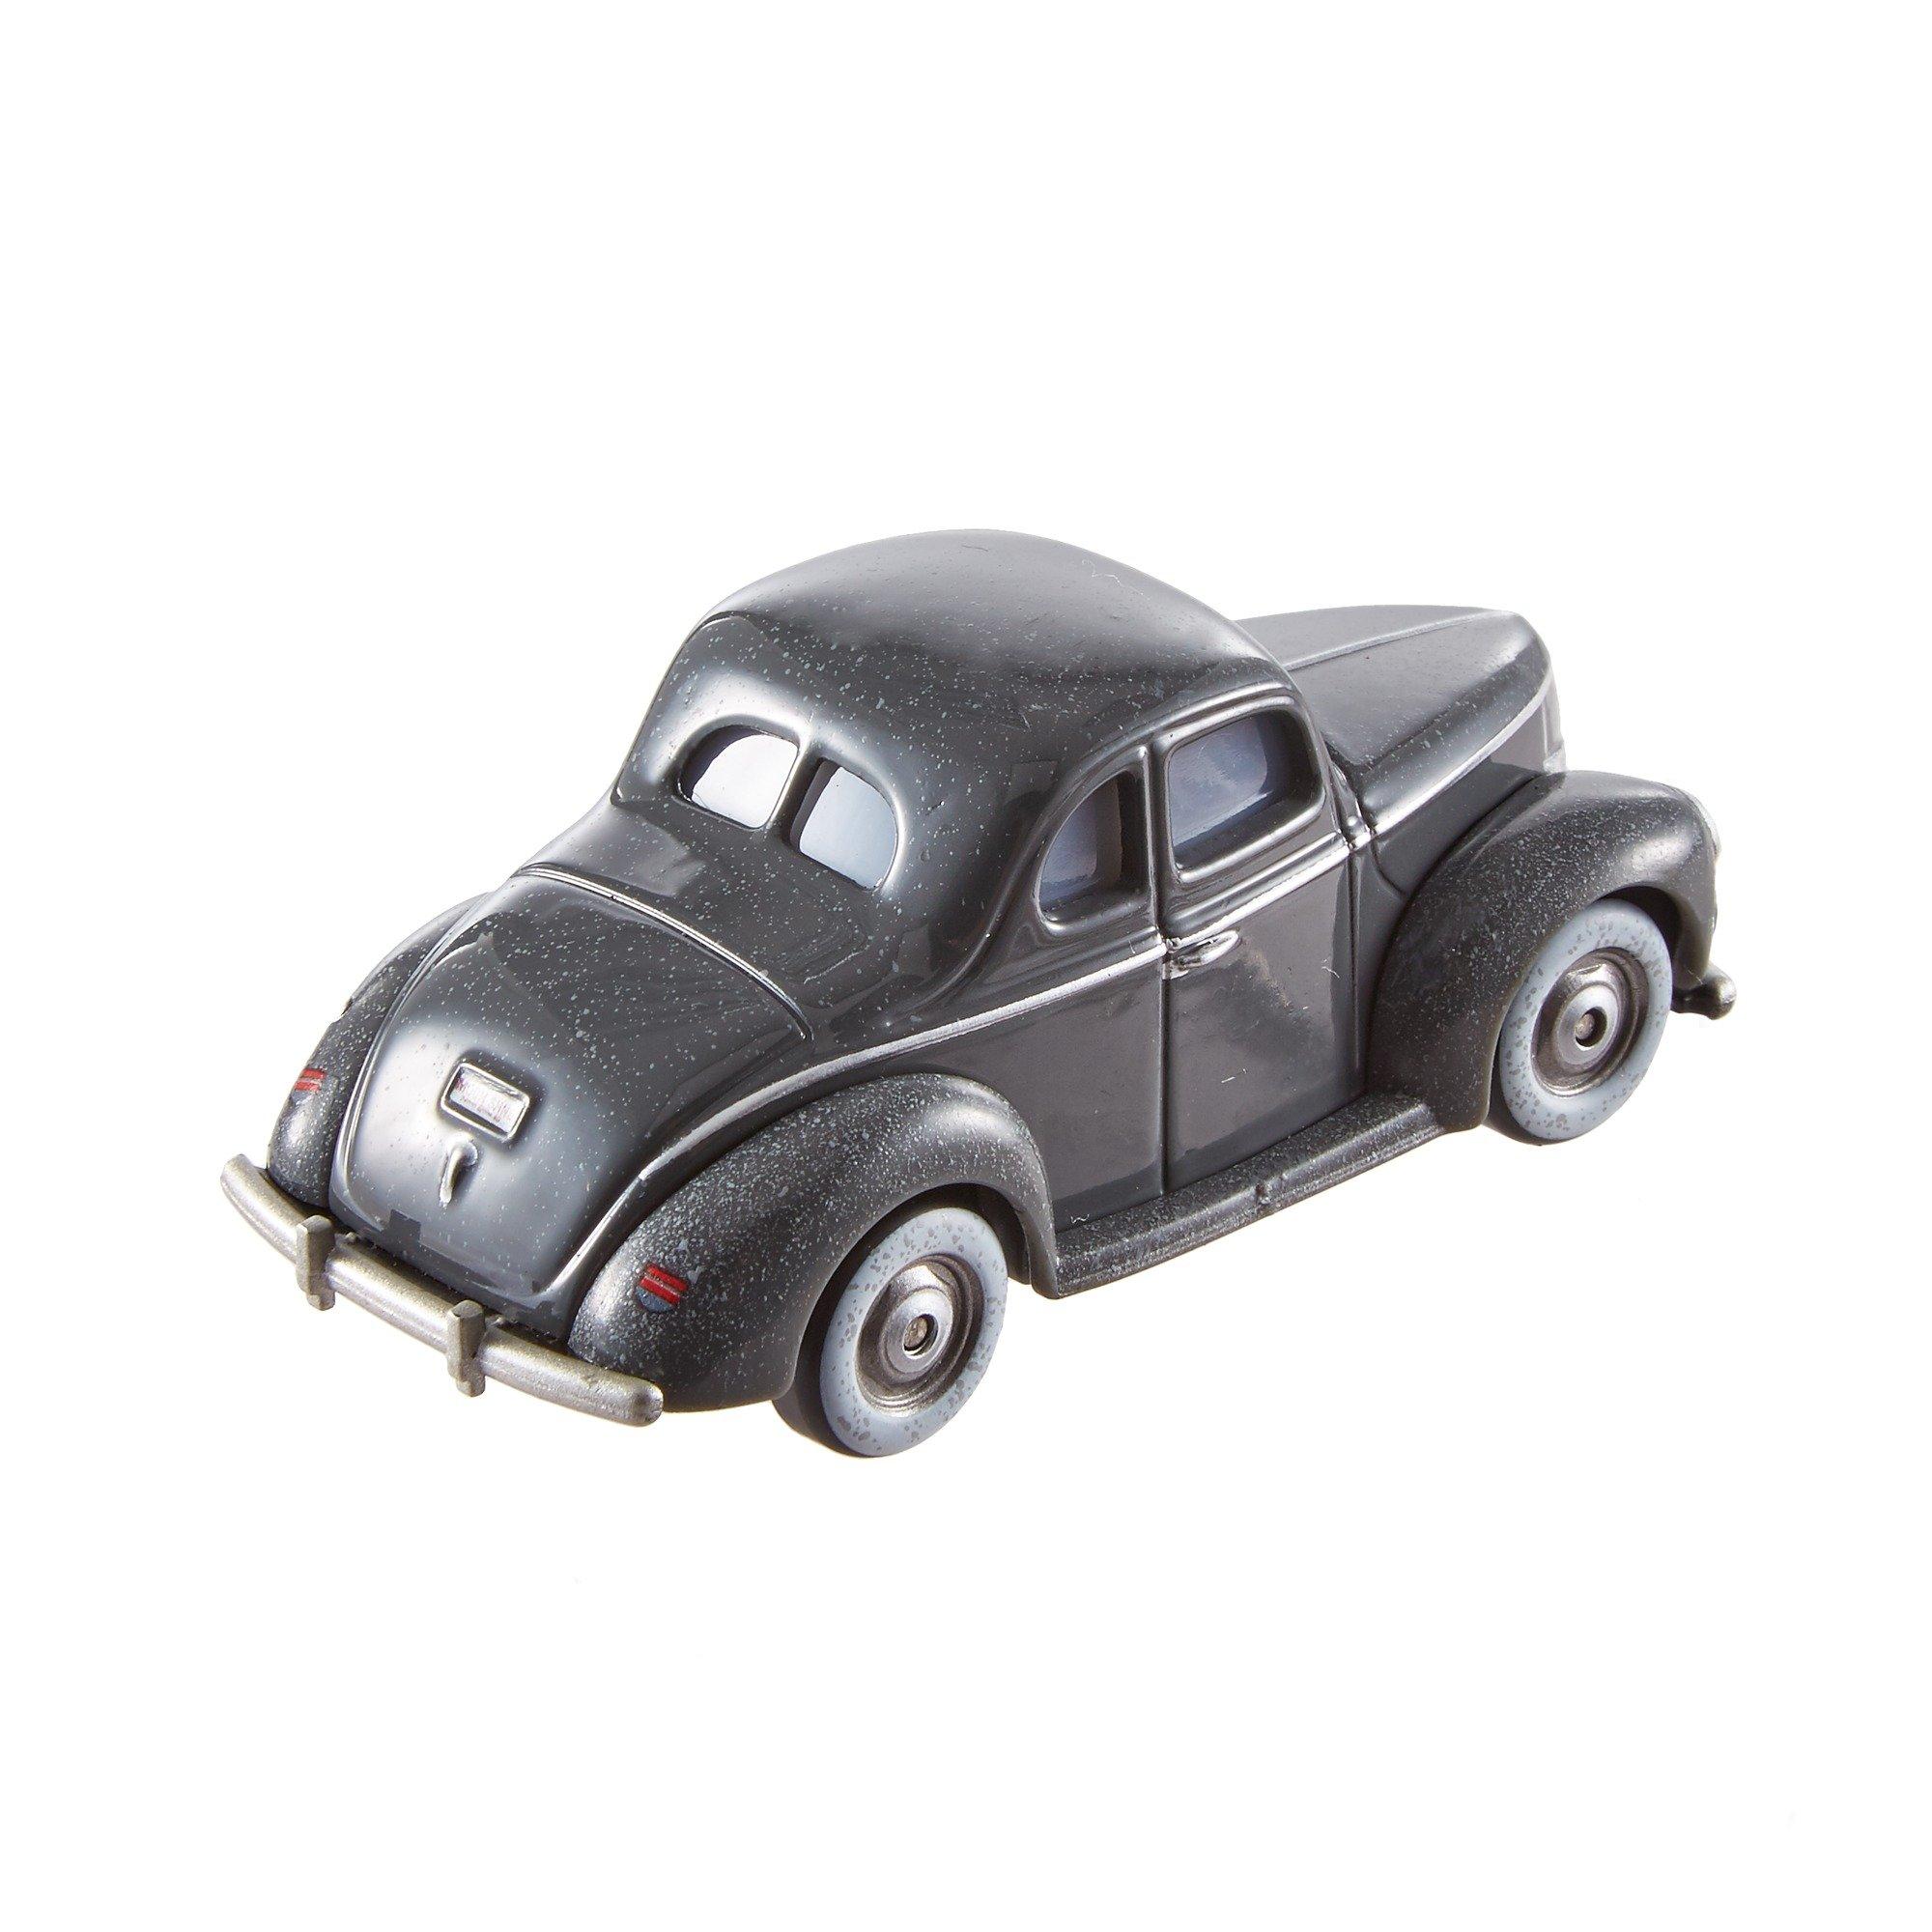 Disney Pixar Cars 3 Diecast Junior Moon Vehicle Dxv77 Play